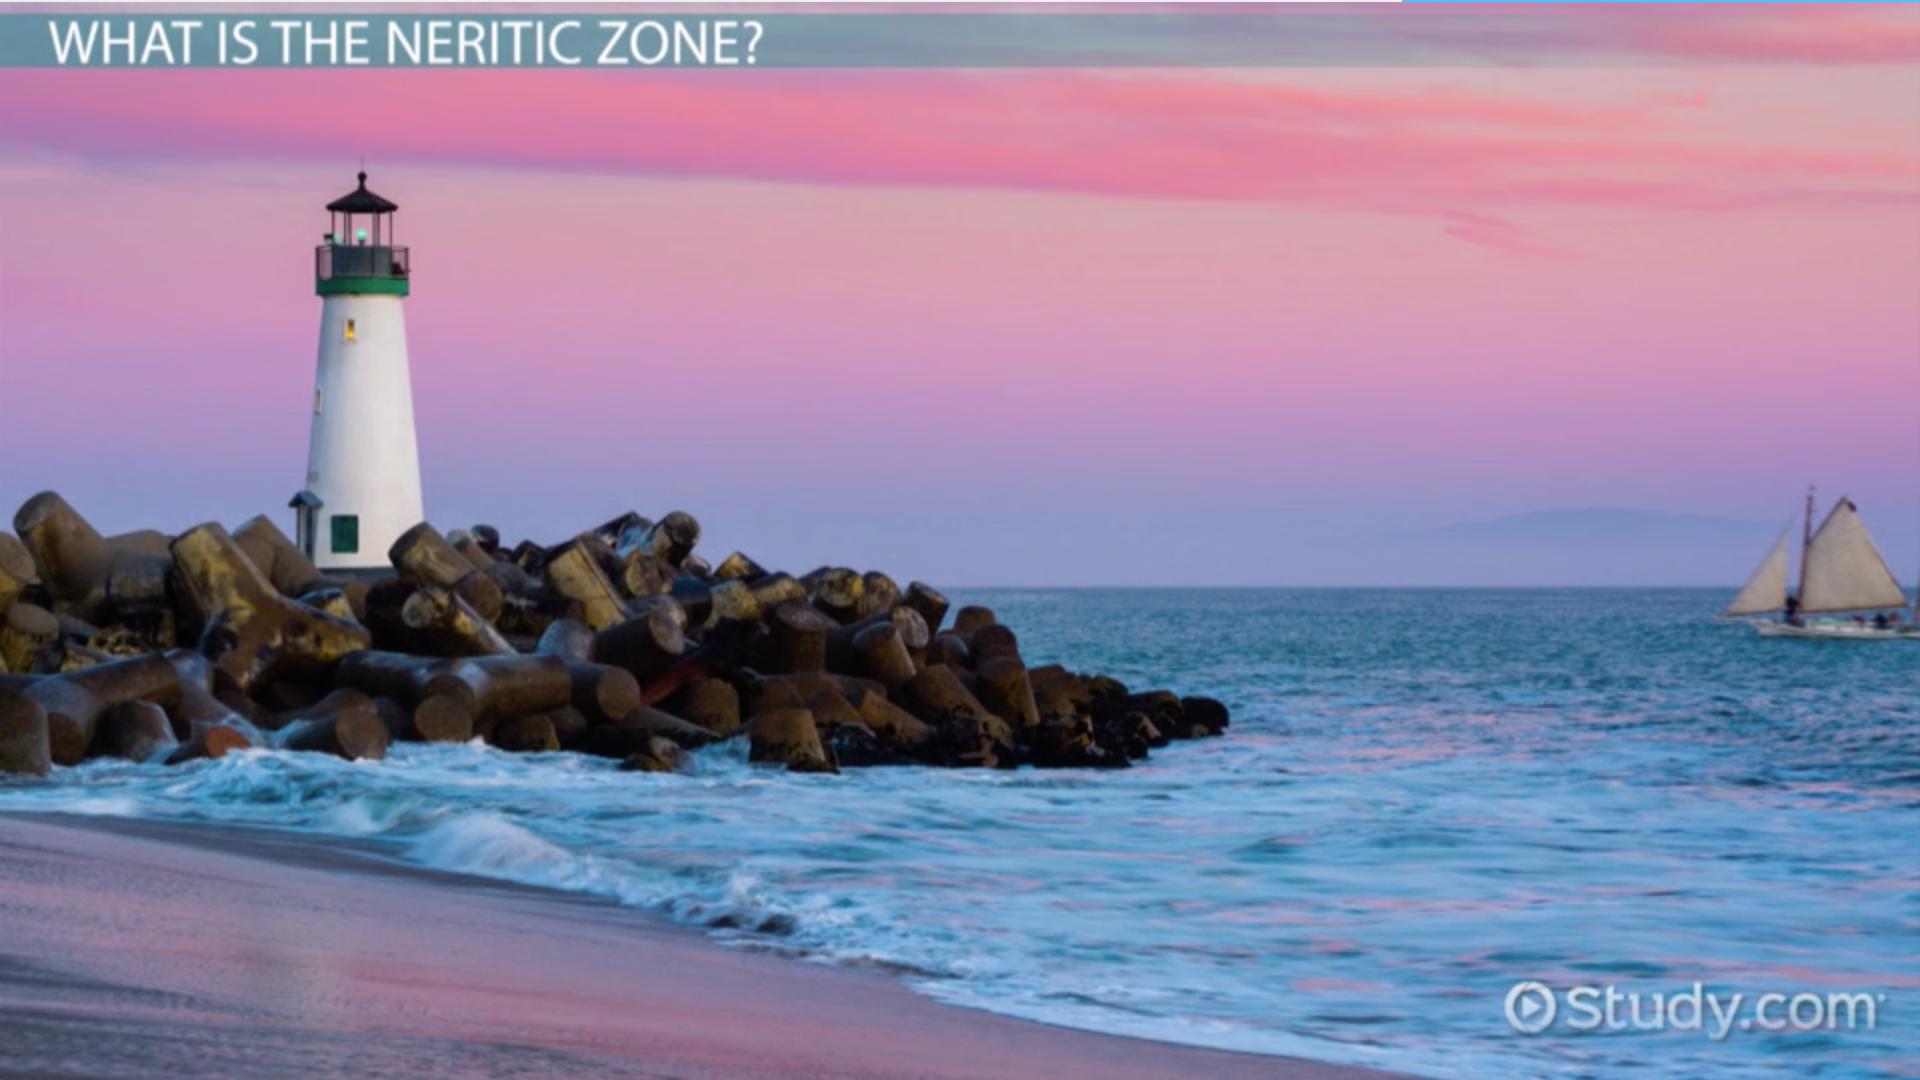 neritic zone  definition  organisms  u0026 climate